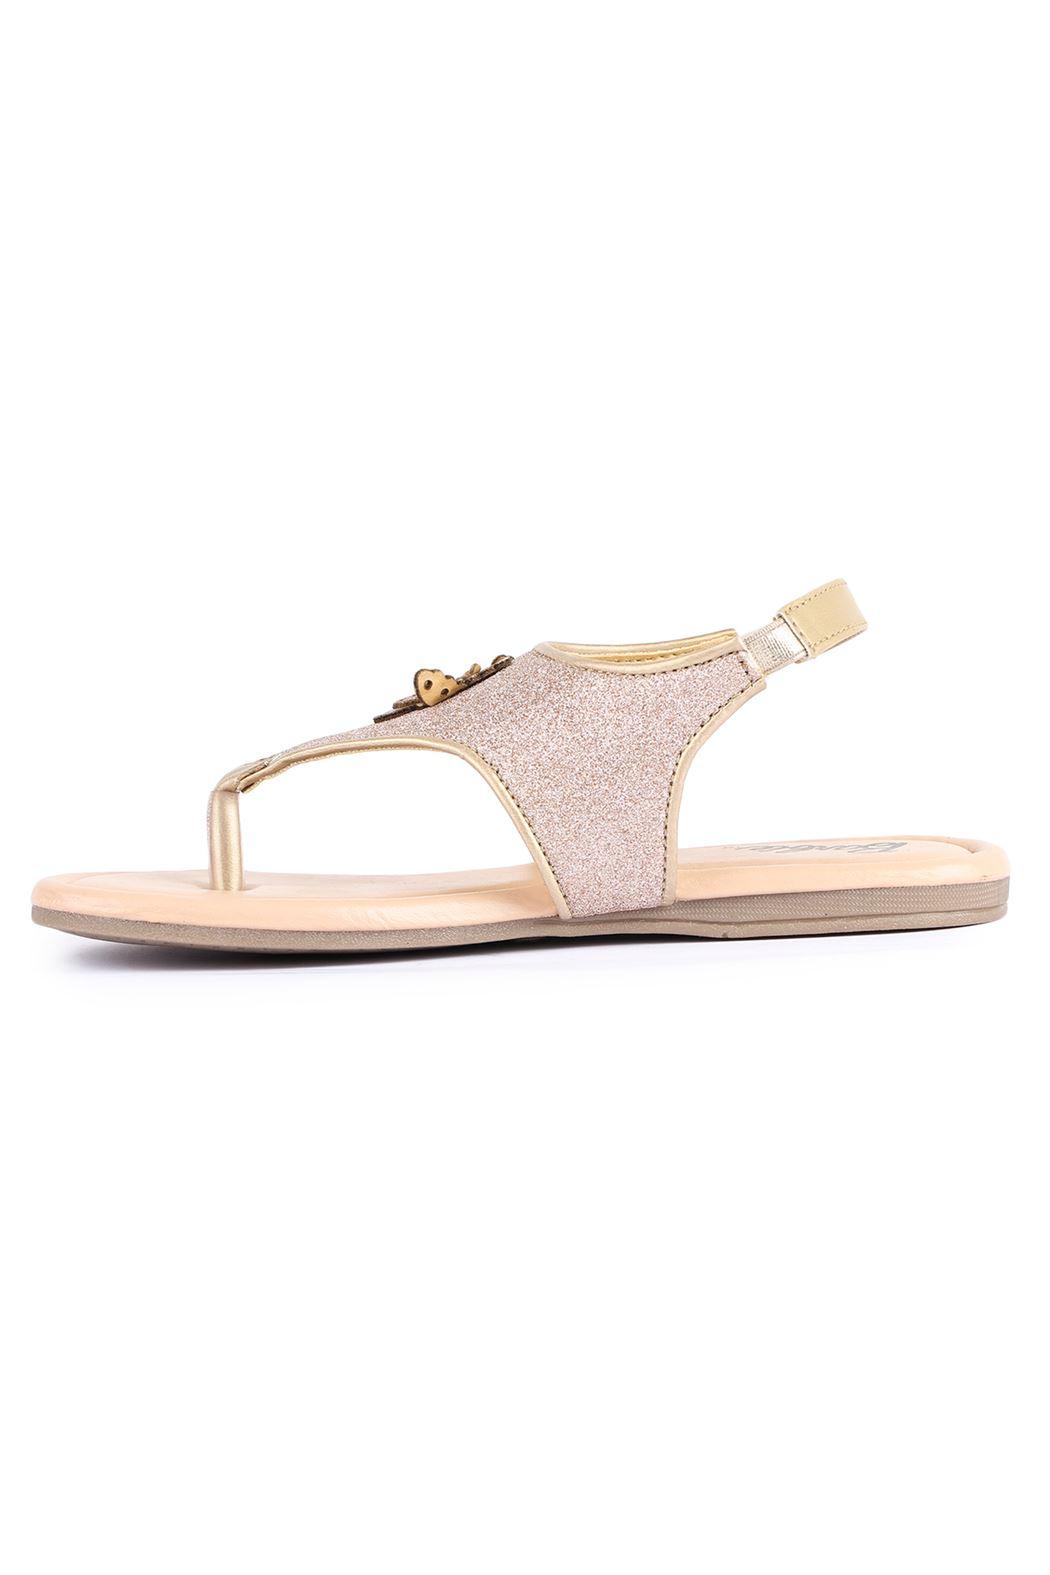 Barbie Girls Gold Casual Wear Sandals